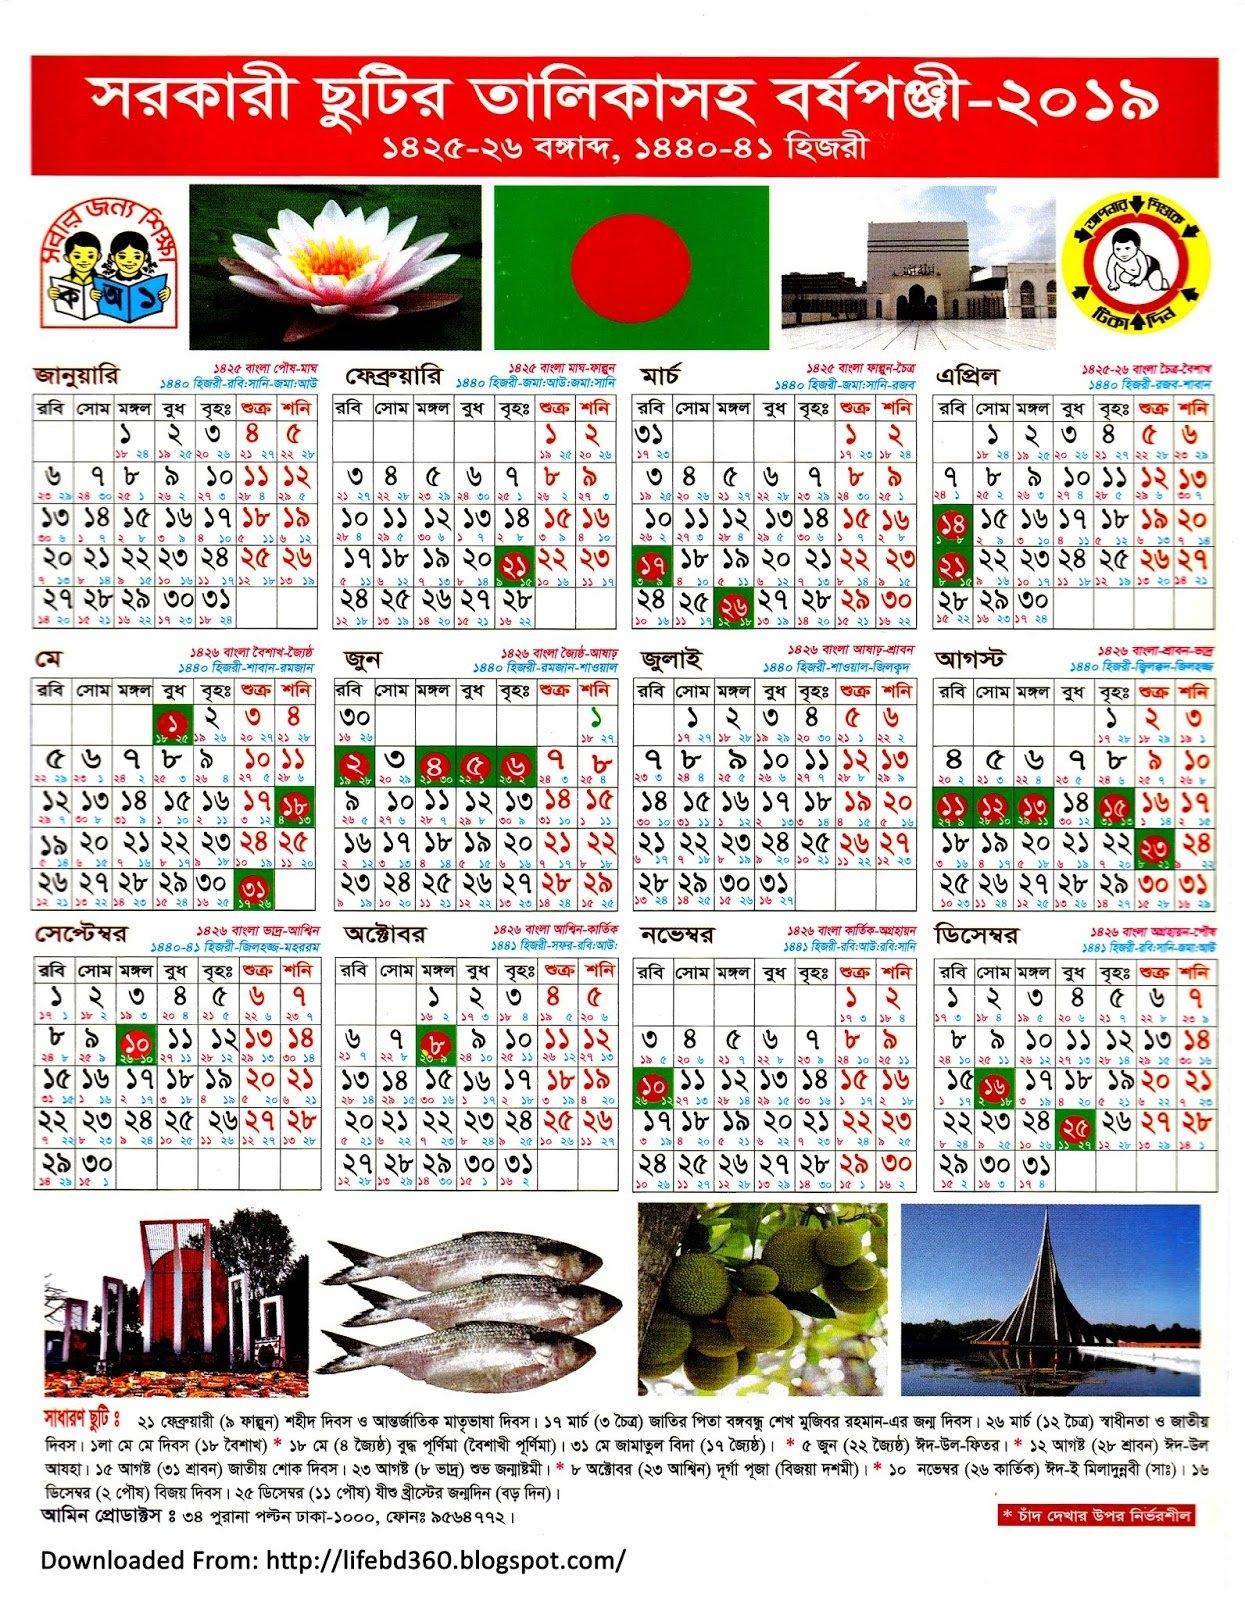 Bangladesh Government Holiday Calendar 2019   Life In Bangladesh Calendar 2019 Government